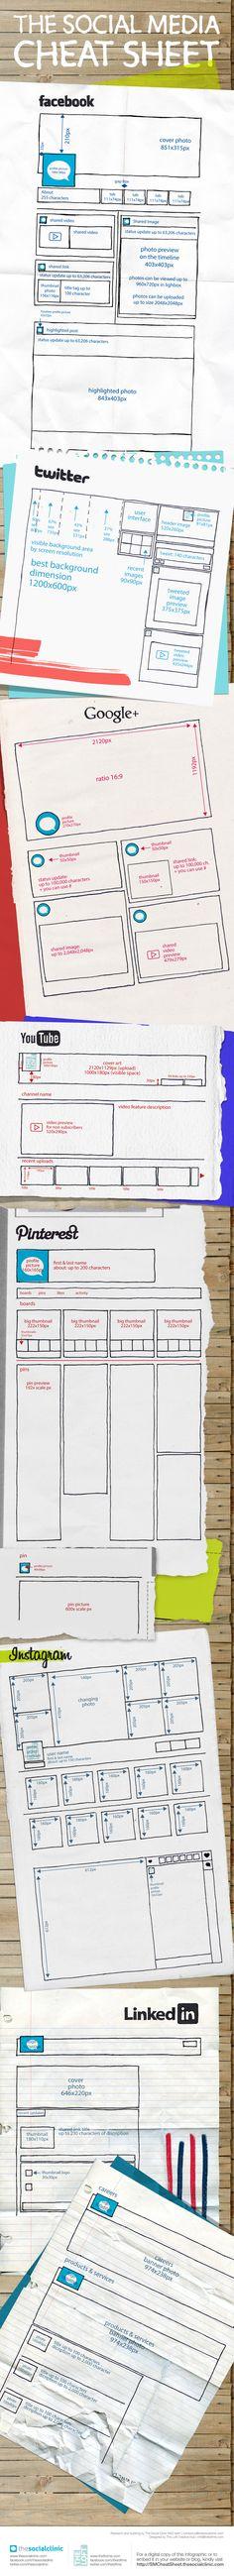 The Social Media Cheat Sheet